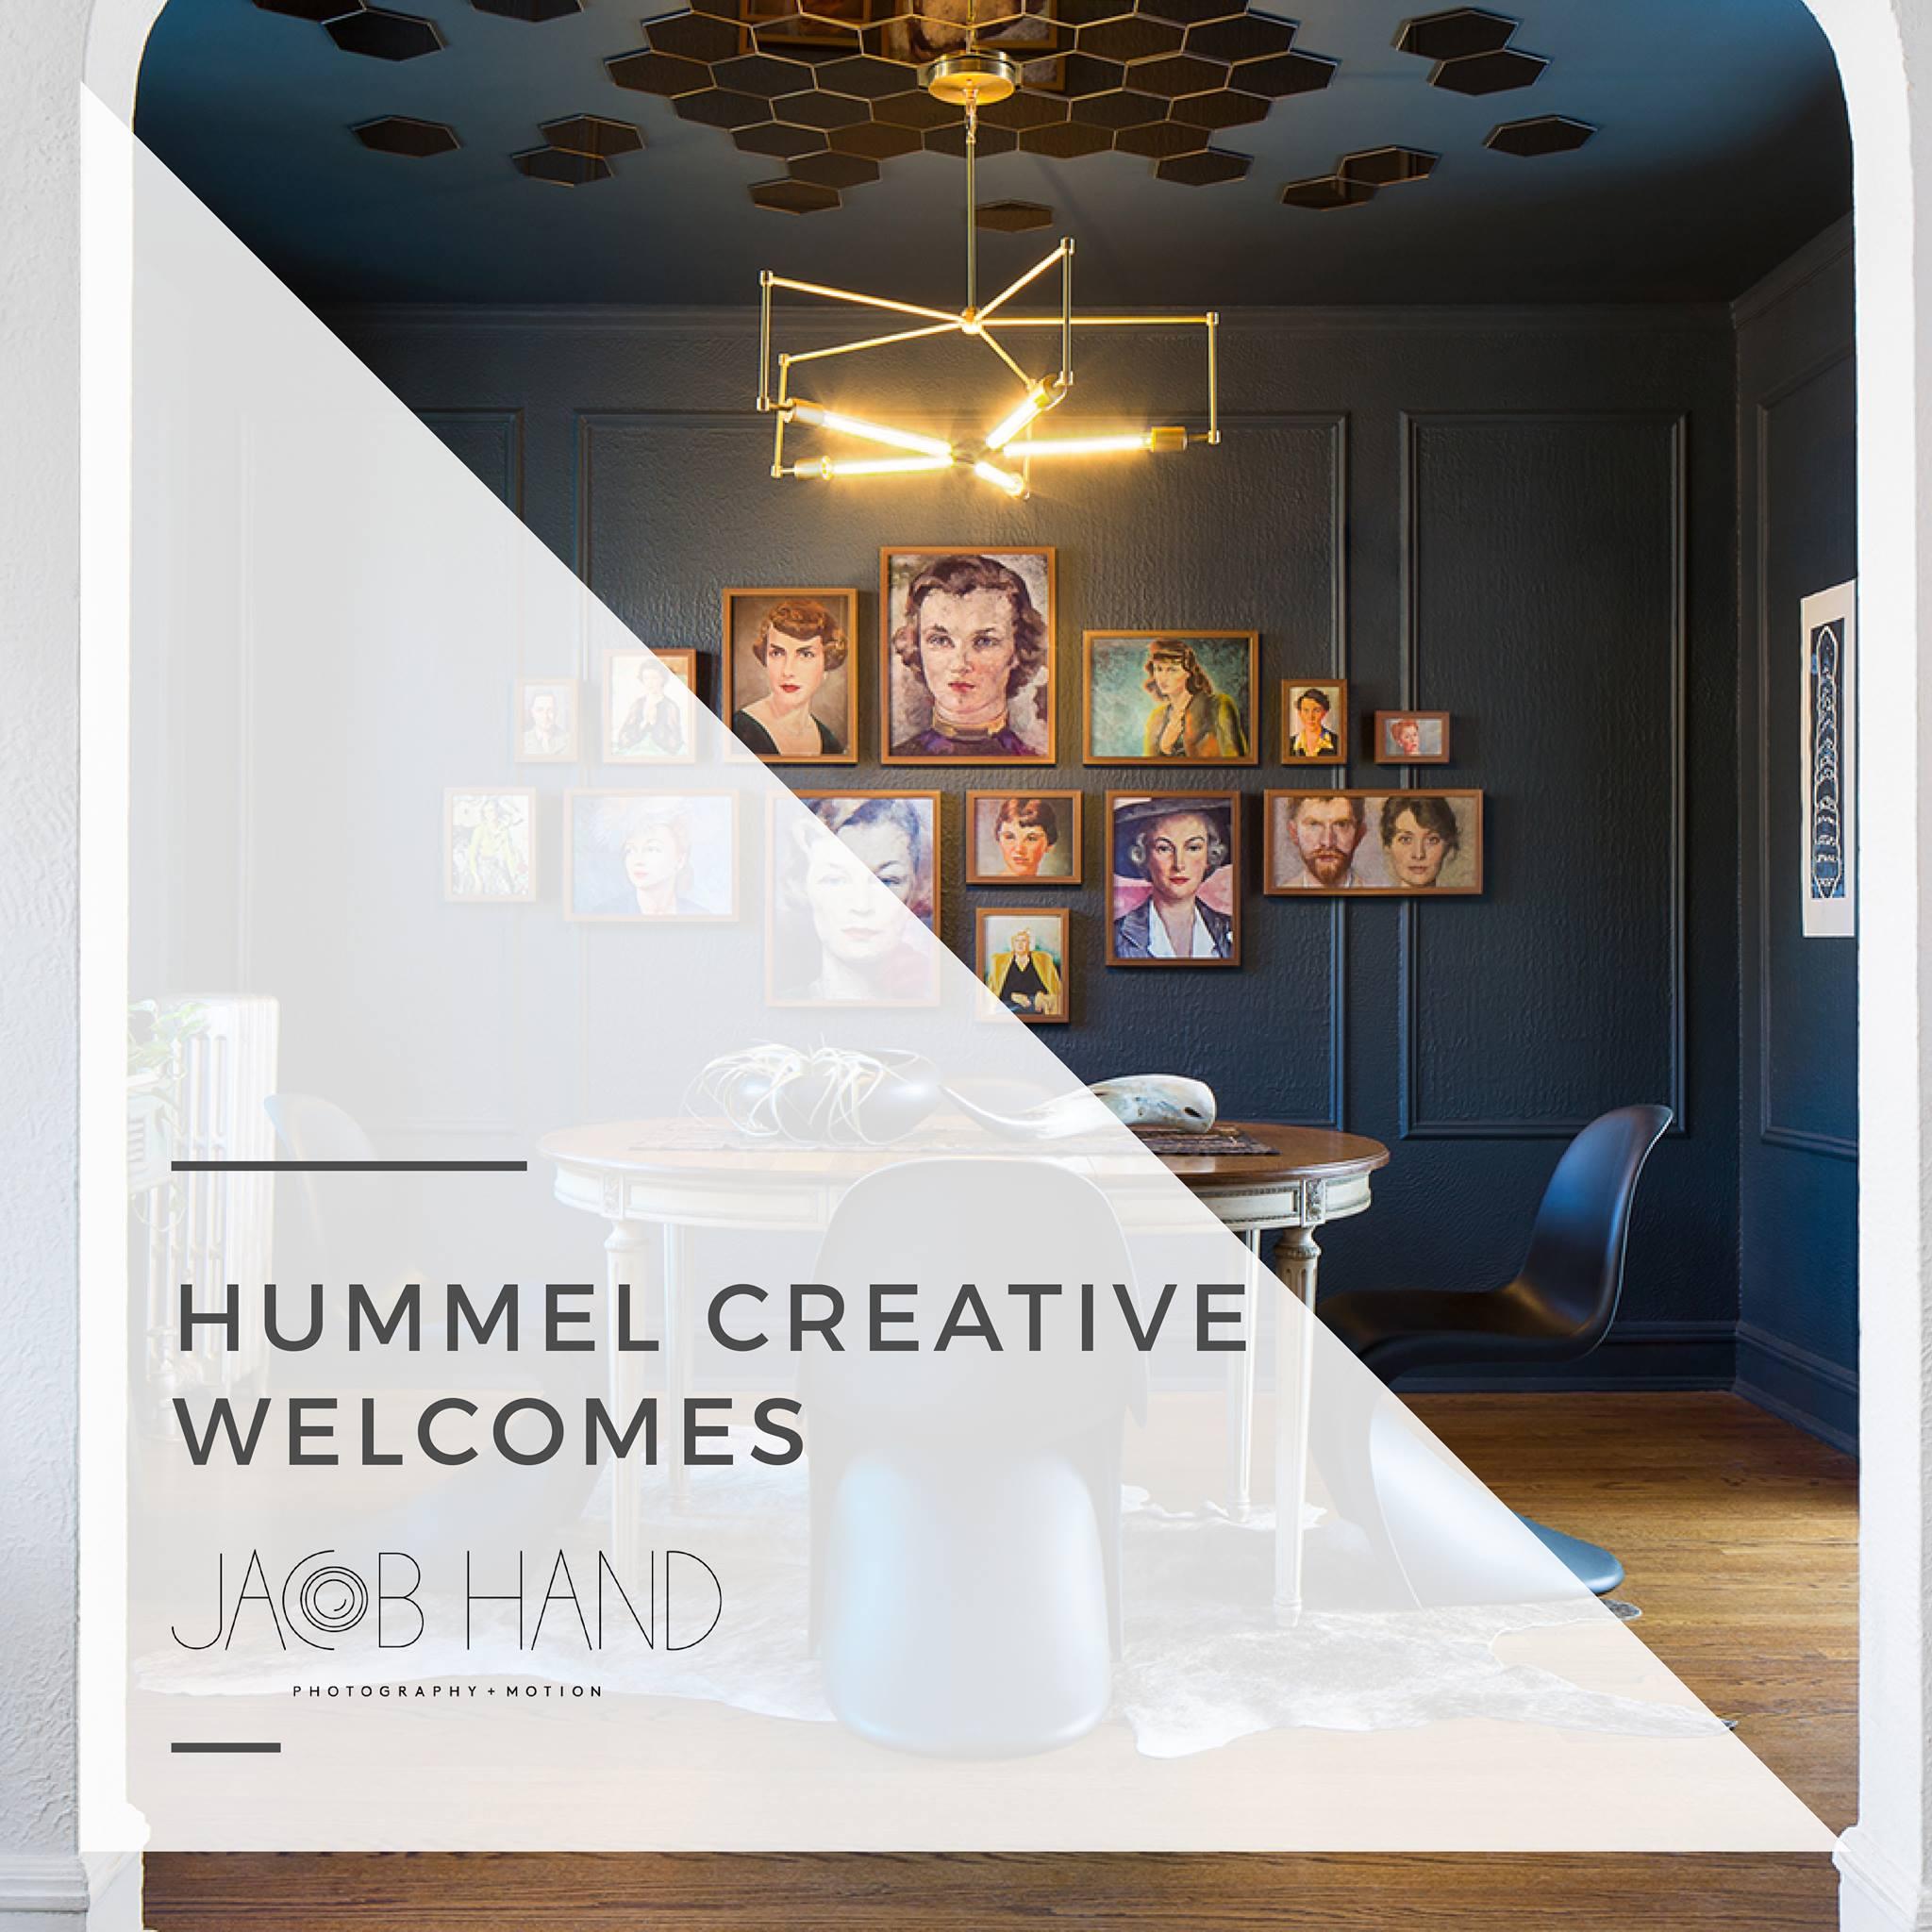 Jacob Hand joins Hummel Creative